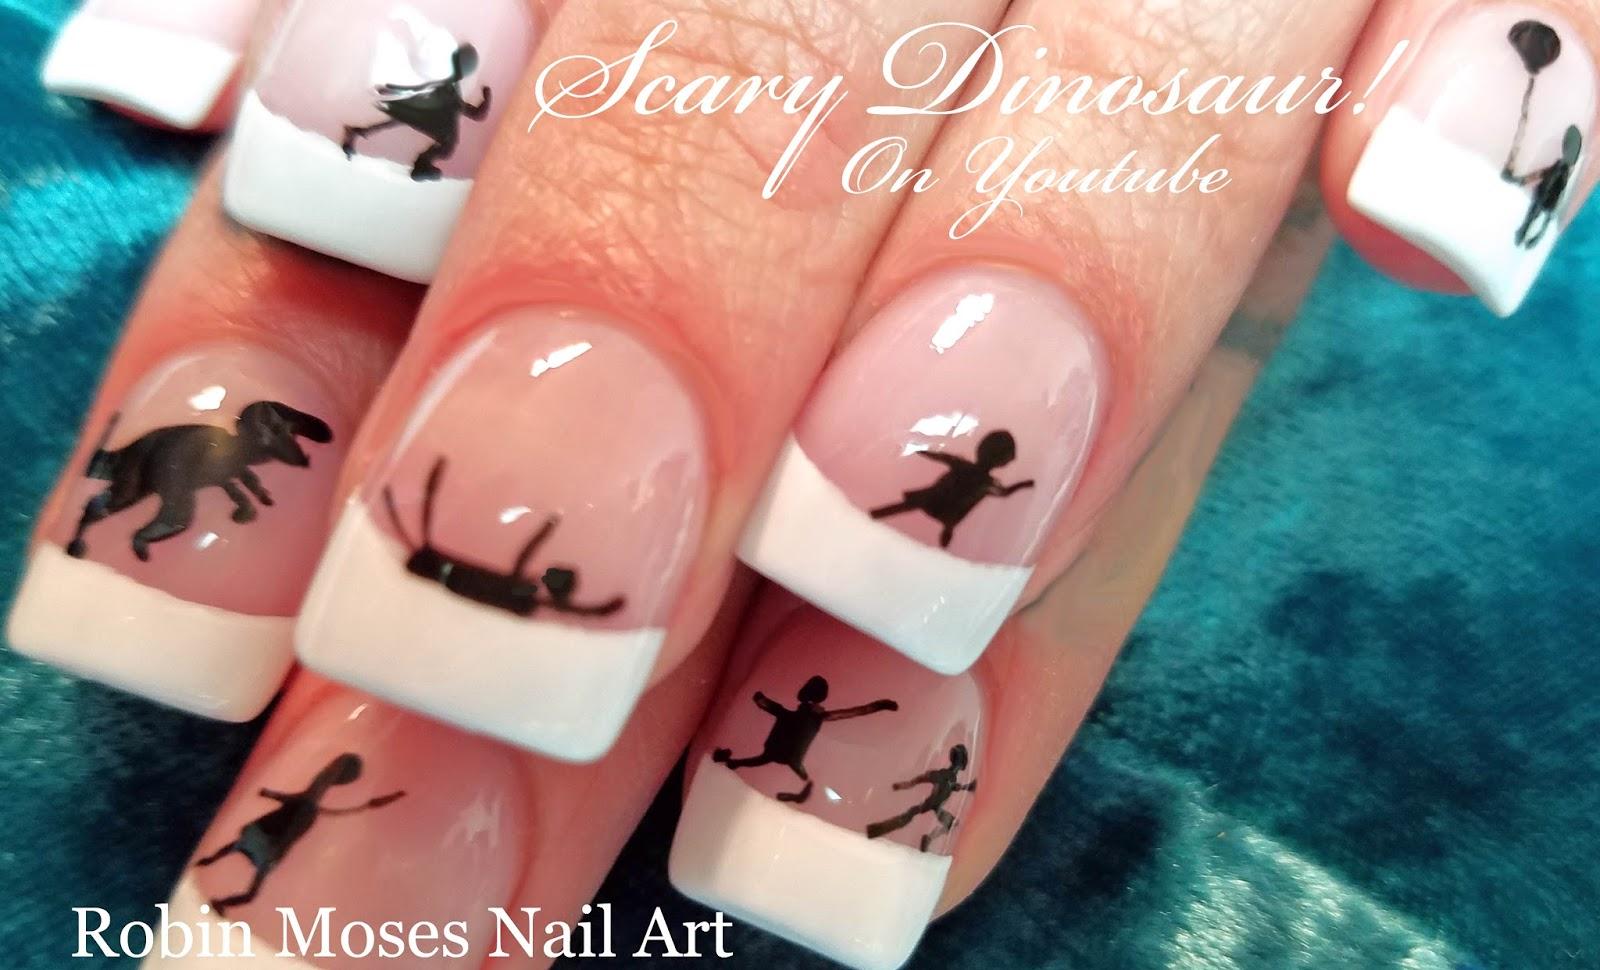 Robin moses nail art minimalist nails minimalist nail art design minimalist nails minimalist nail art design tutorial prinsesfo Gallery